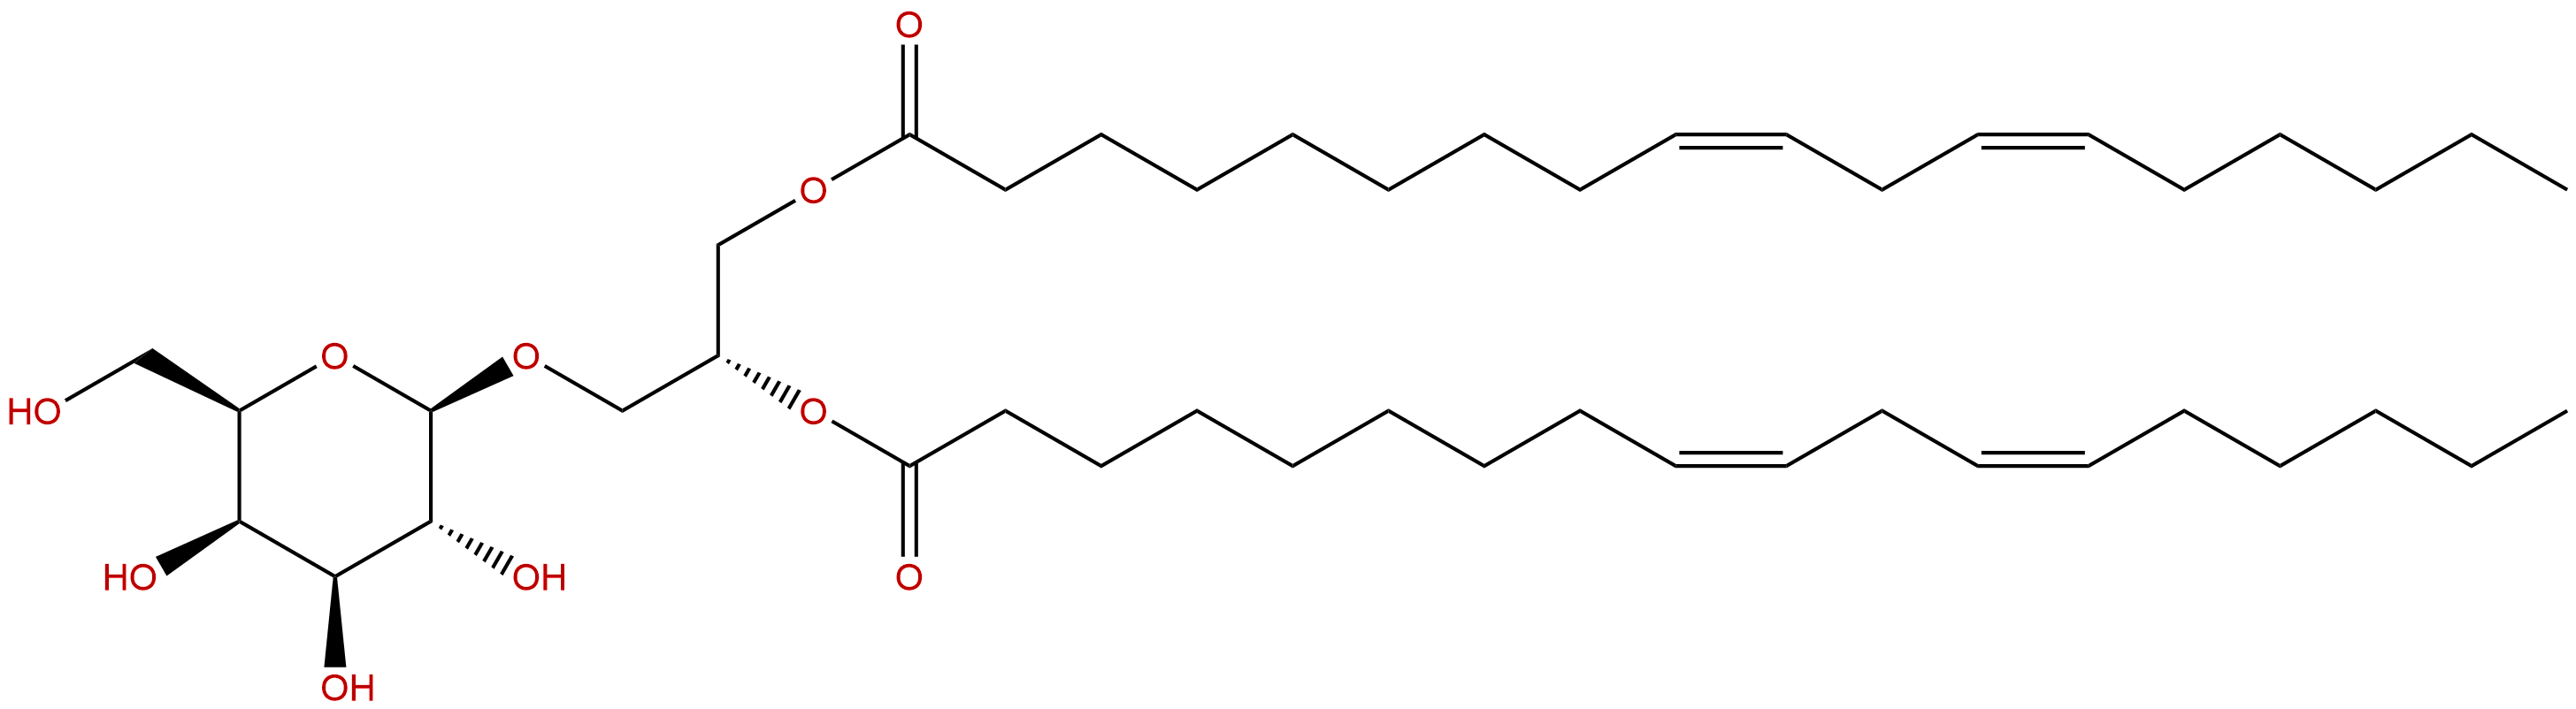 1,2-O-Dilinoleoyl-3-O-beta-D-galactopyranosylracglycerol